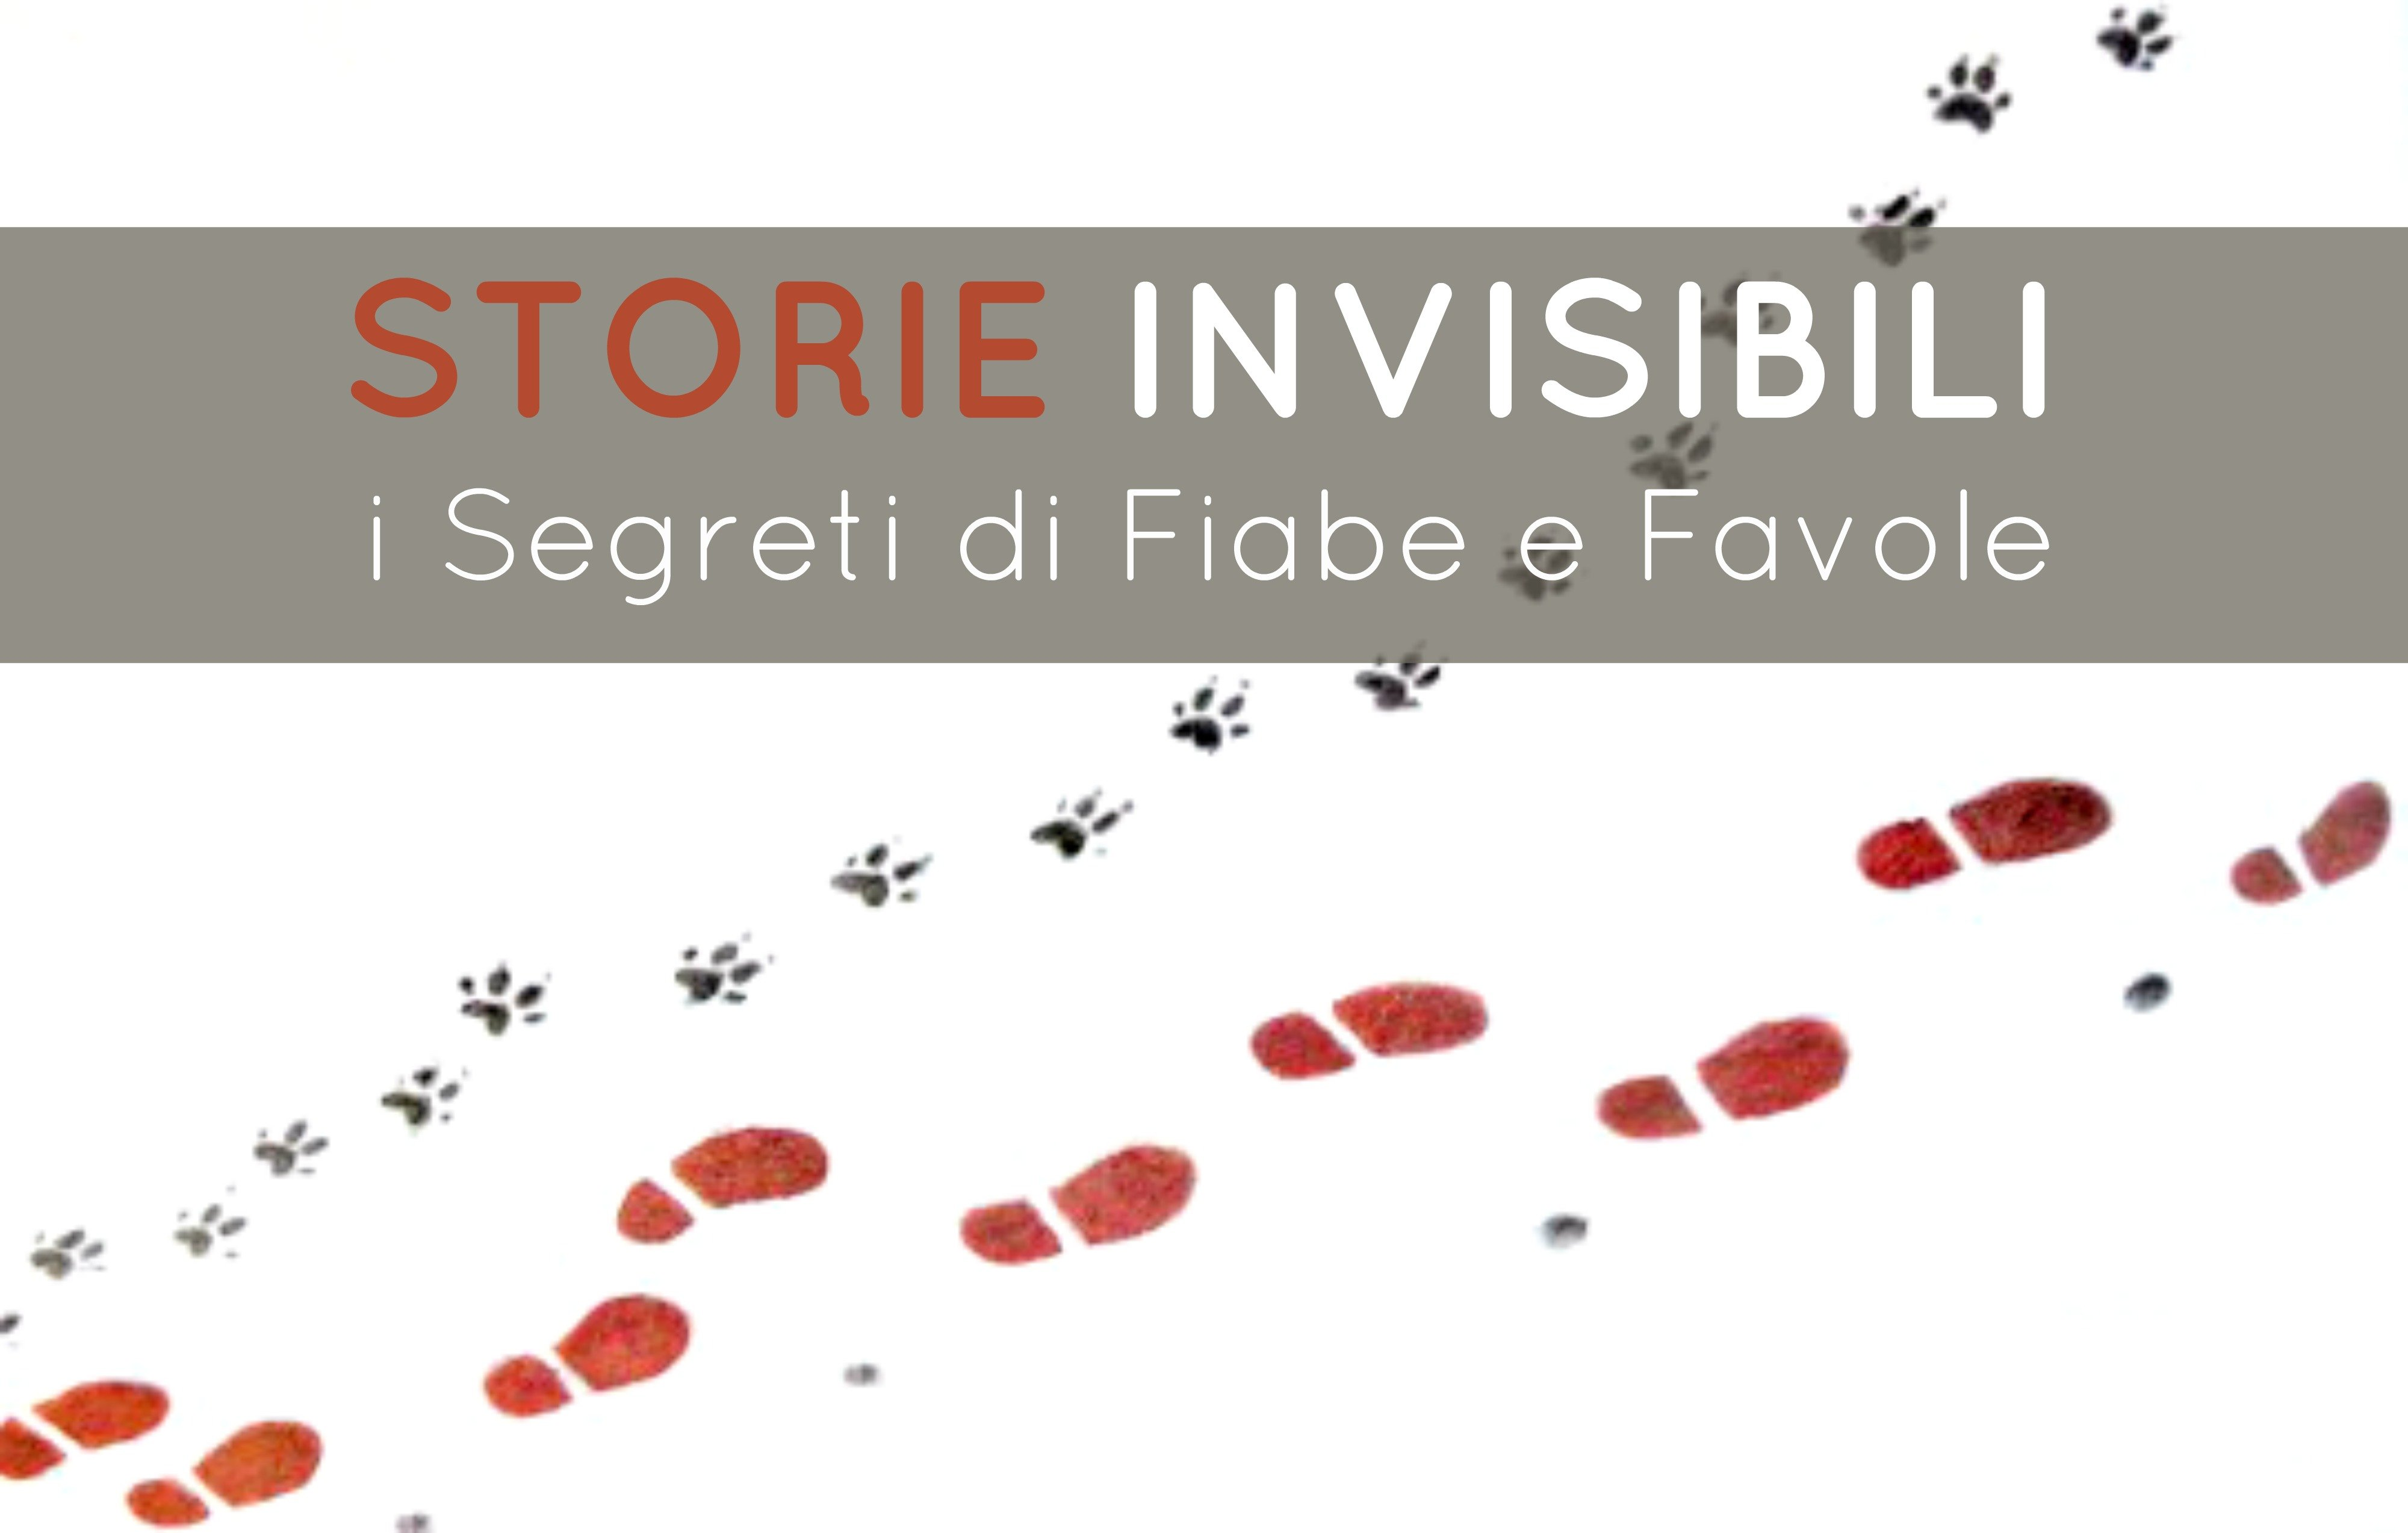 Storie Invisibili